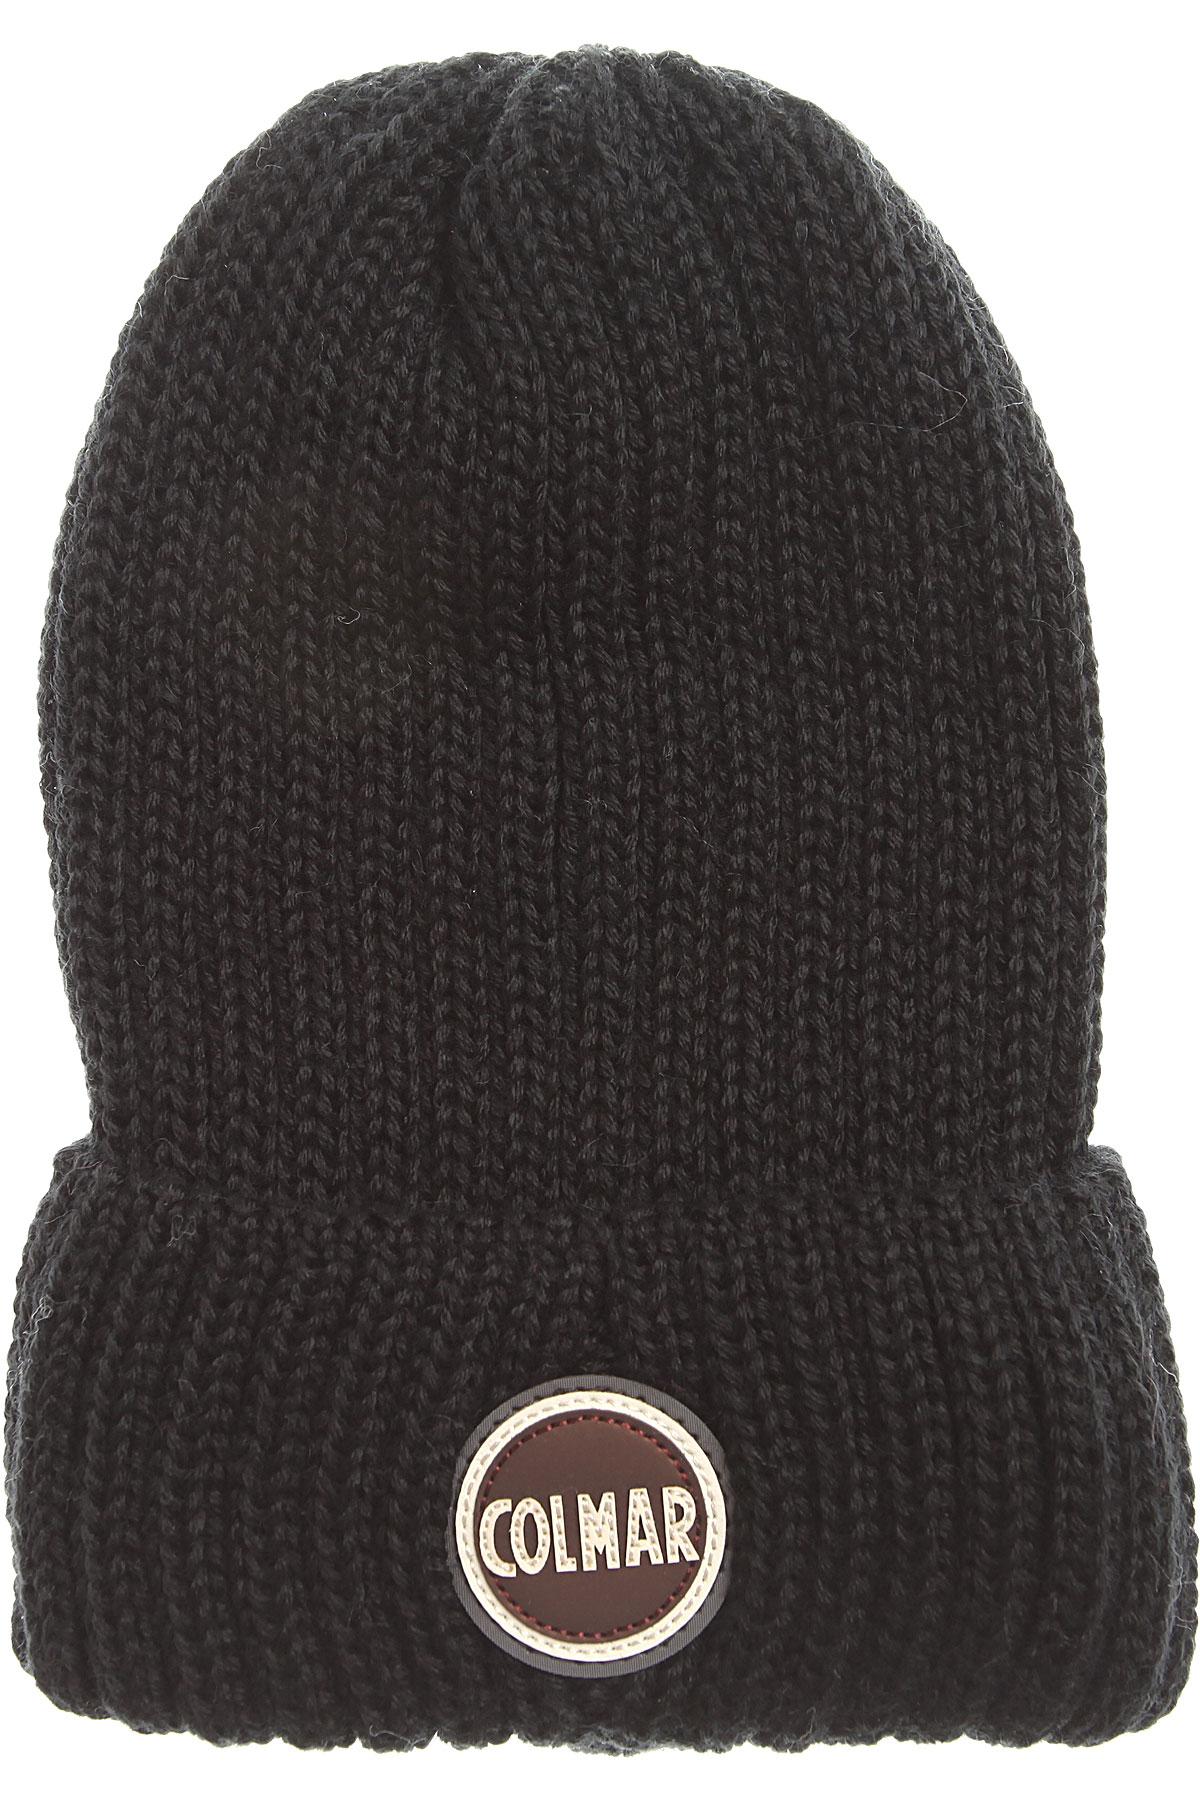 Image of Colmar Hat for Women, Black, Wool, 2017